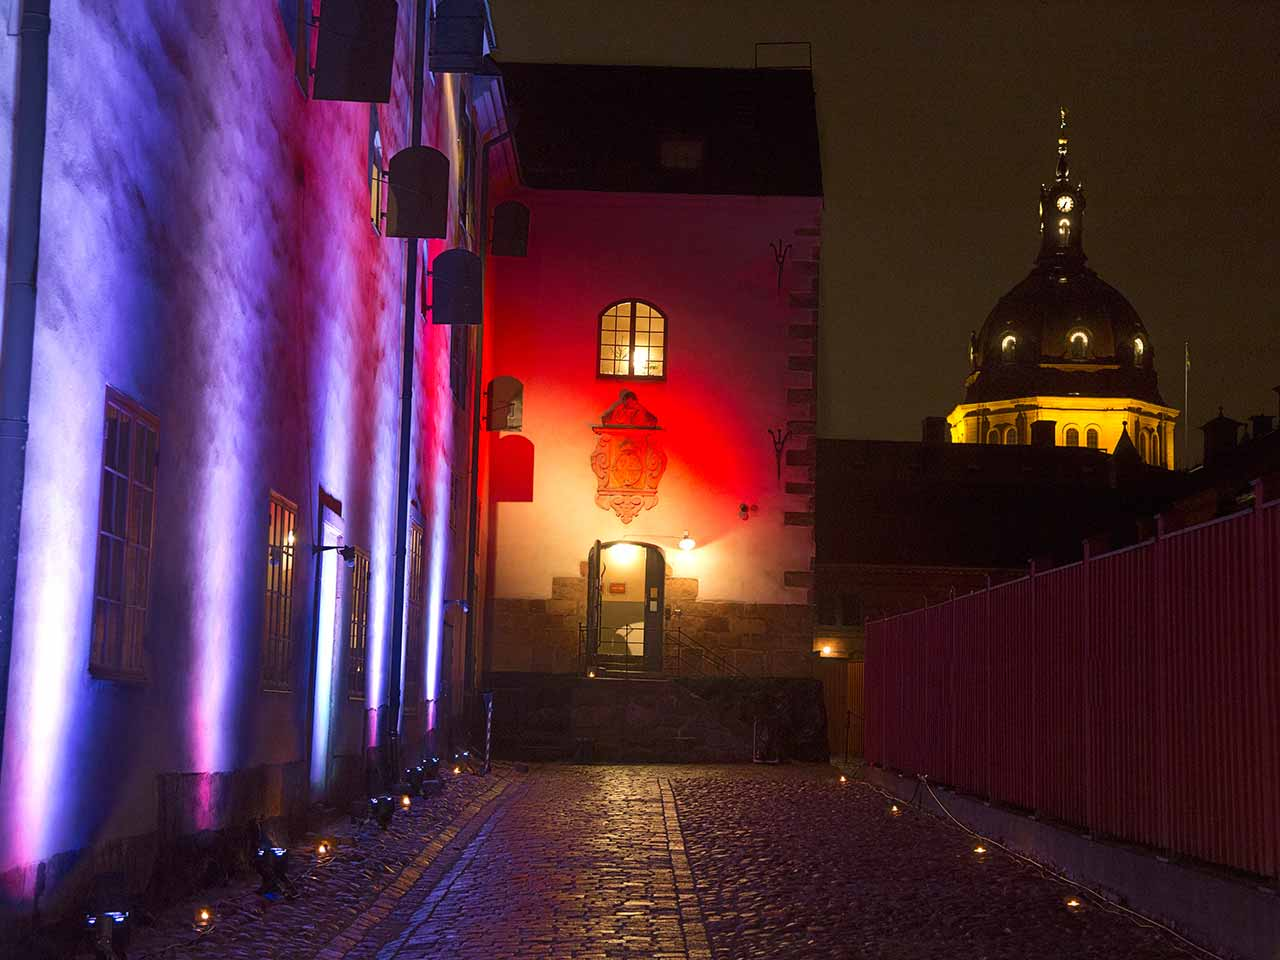 Scenkonstmuseet - Eventlokal Östermalm - Entré